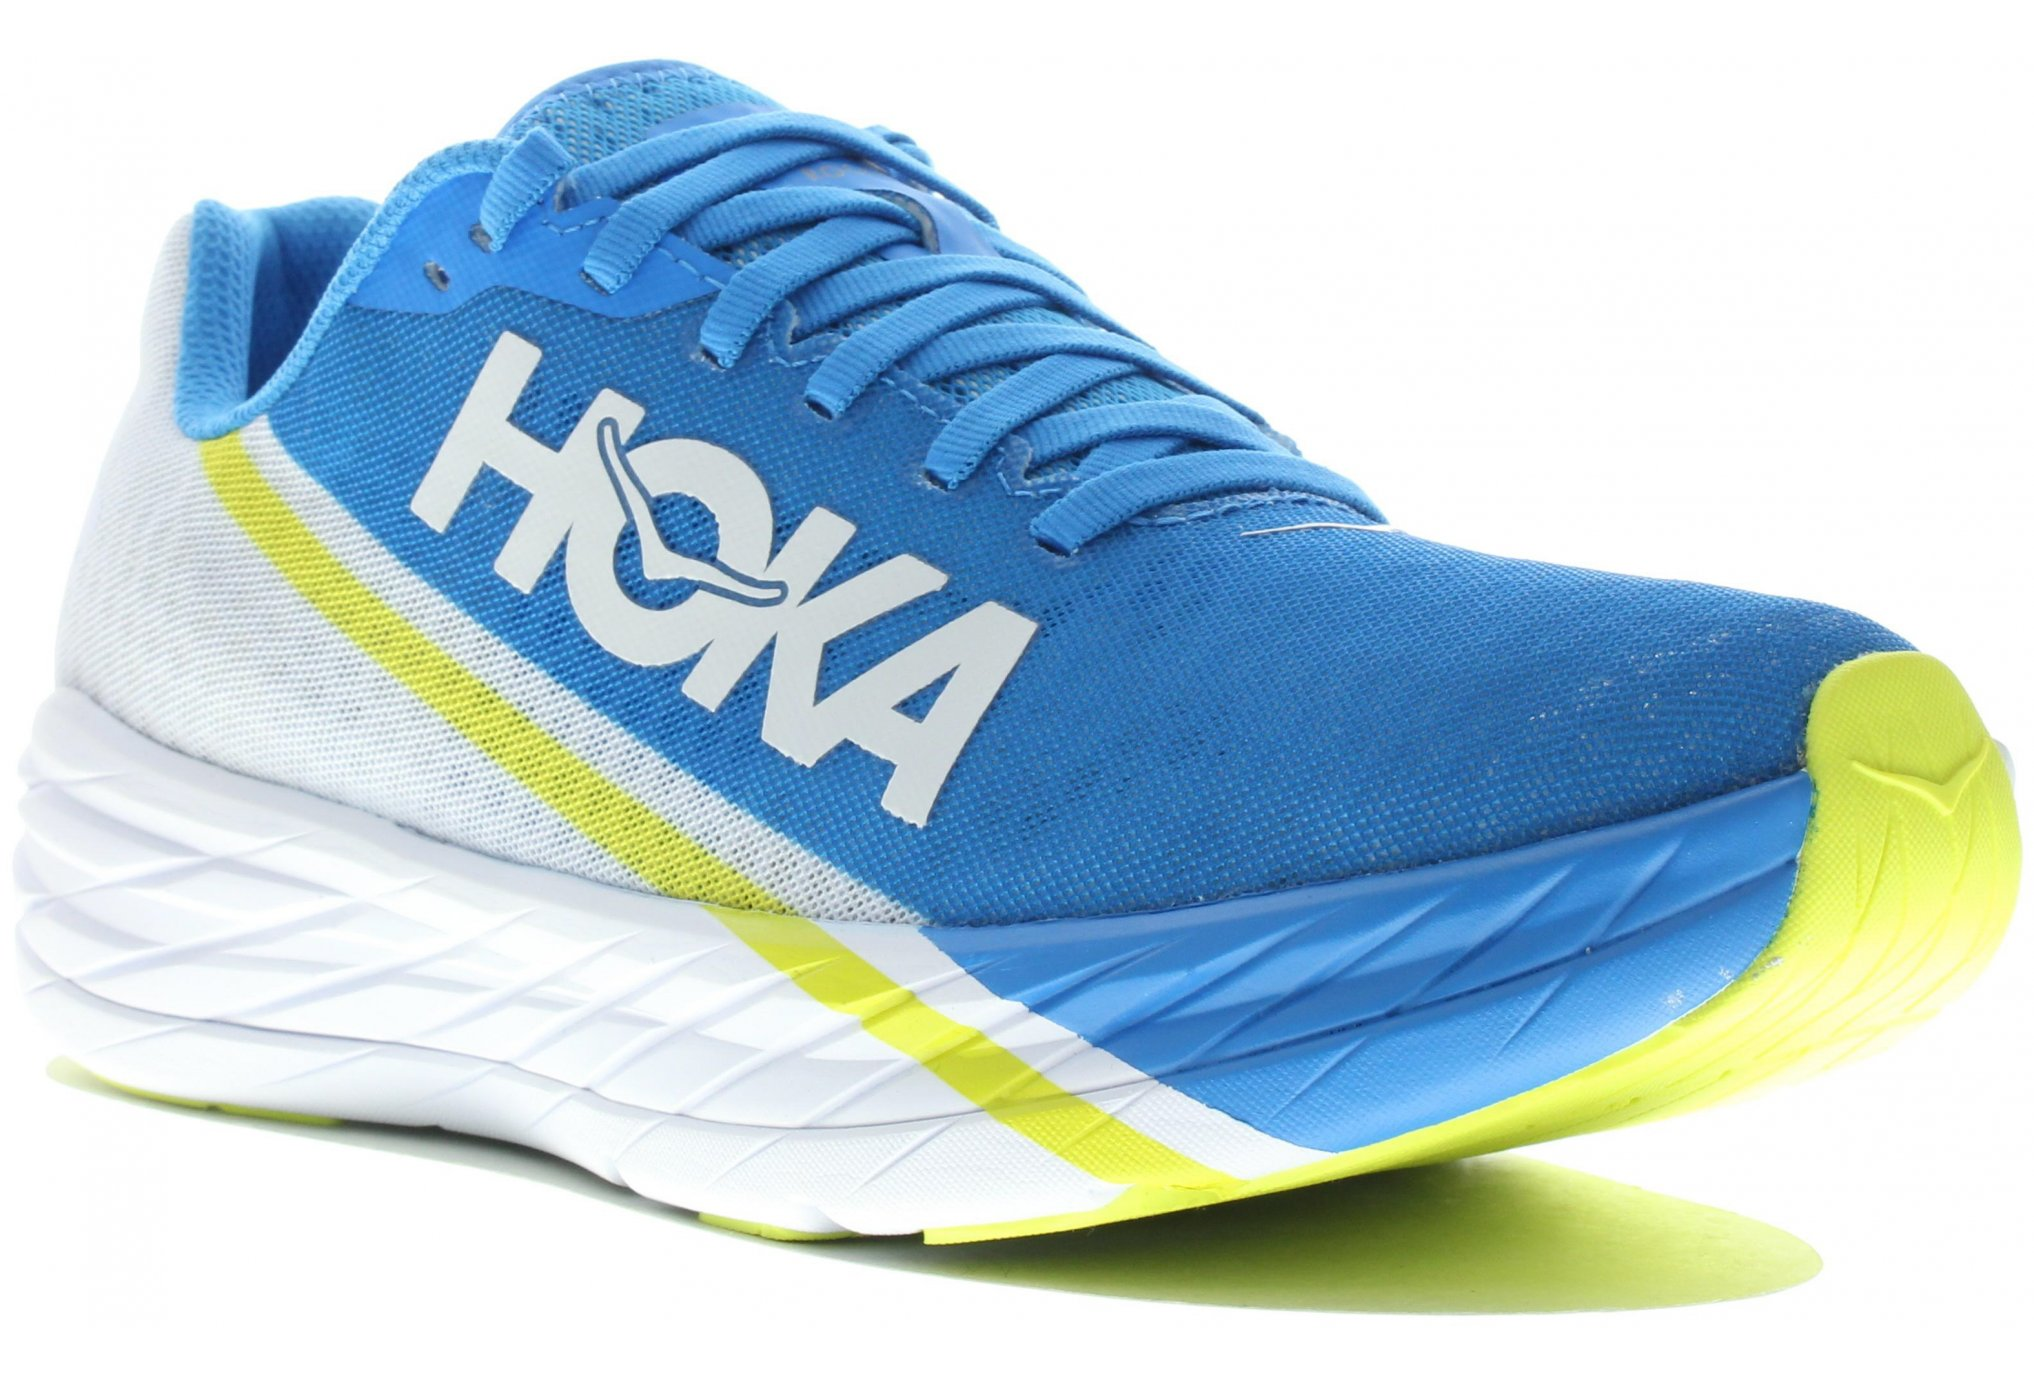 Hoka One One Rocket X Chaussures running femme